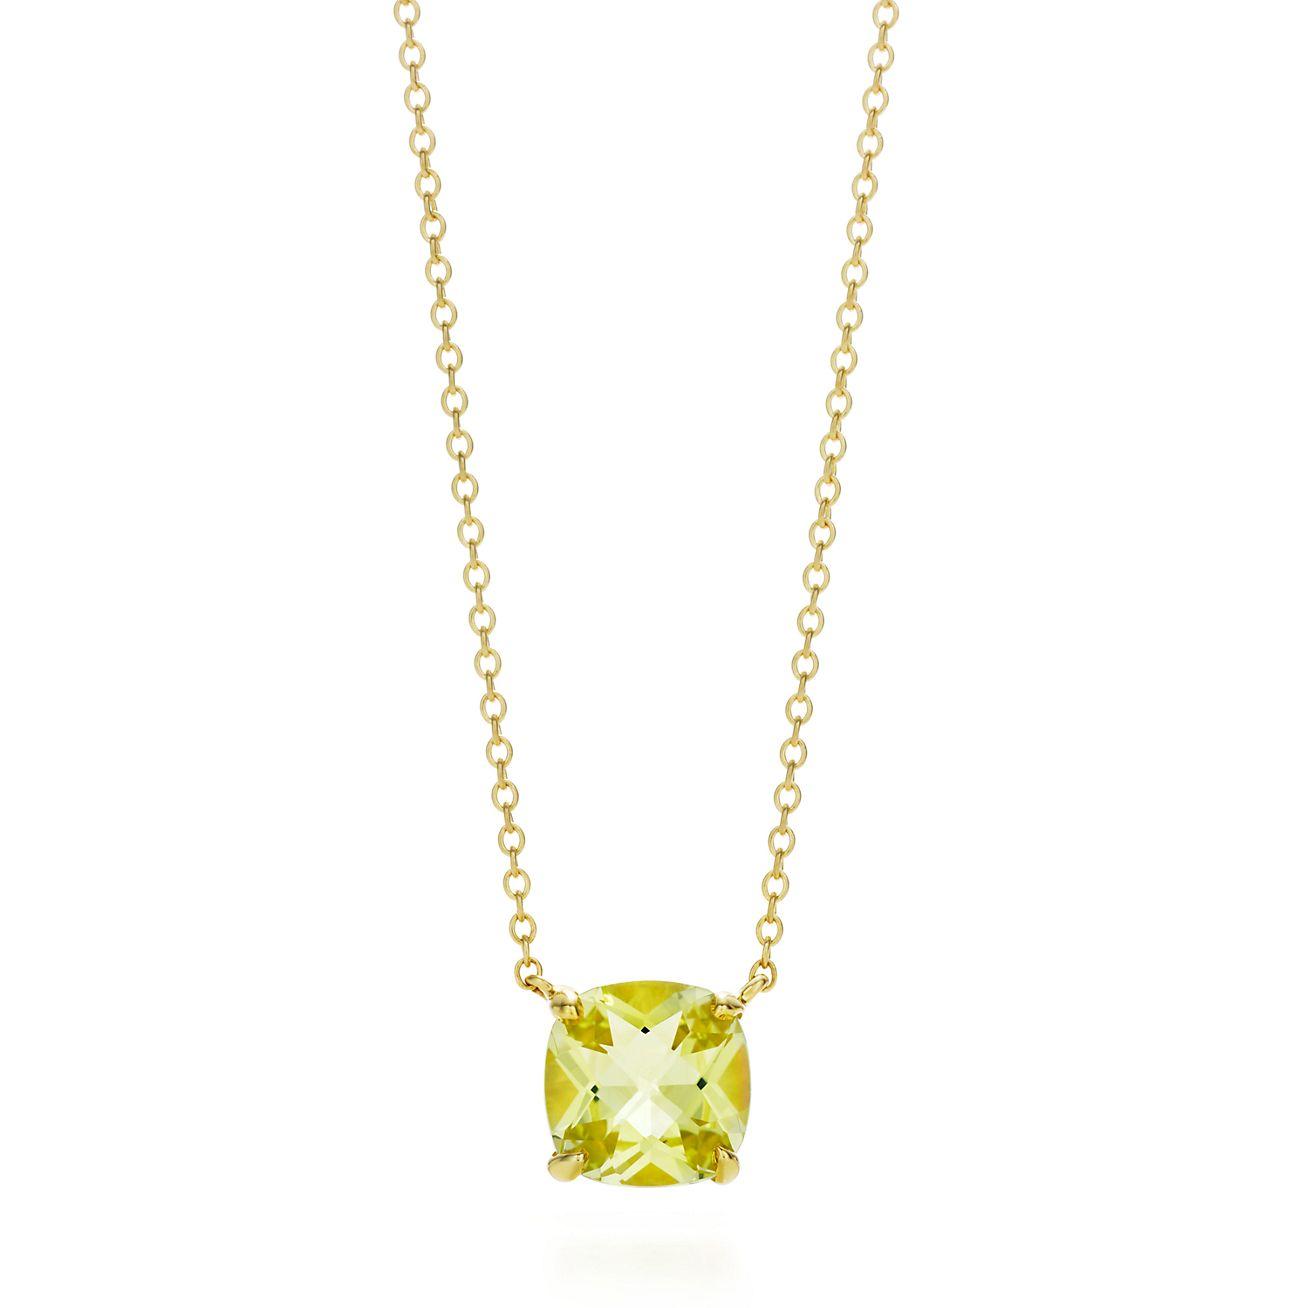 Tiffany Sparklers Yellow Citrine Pendant